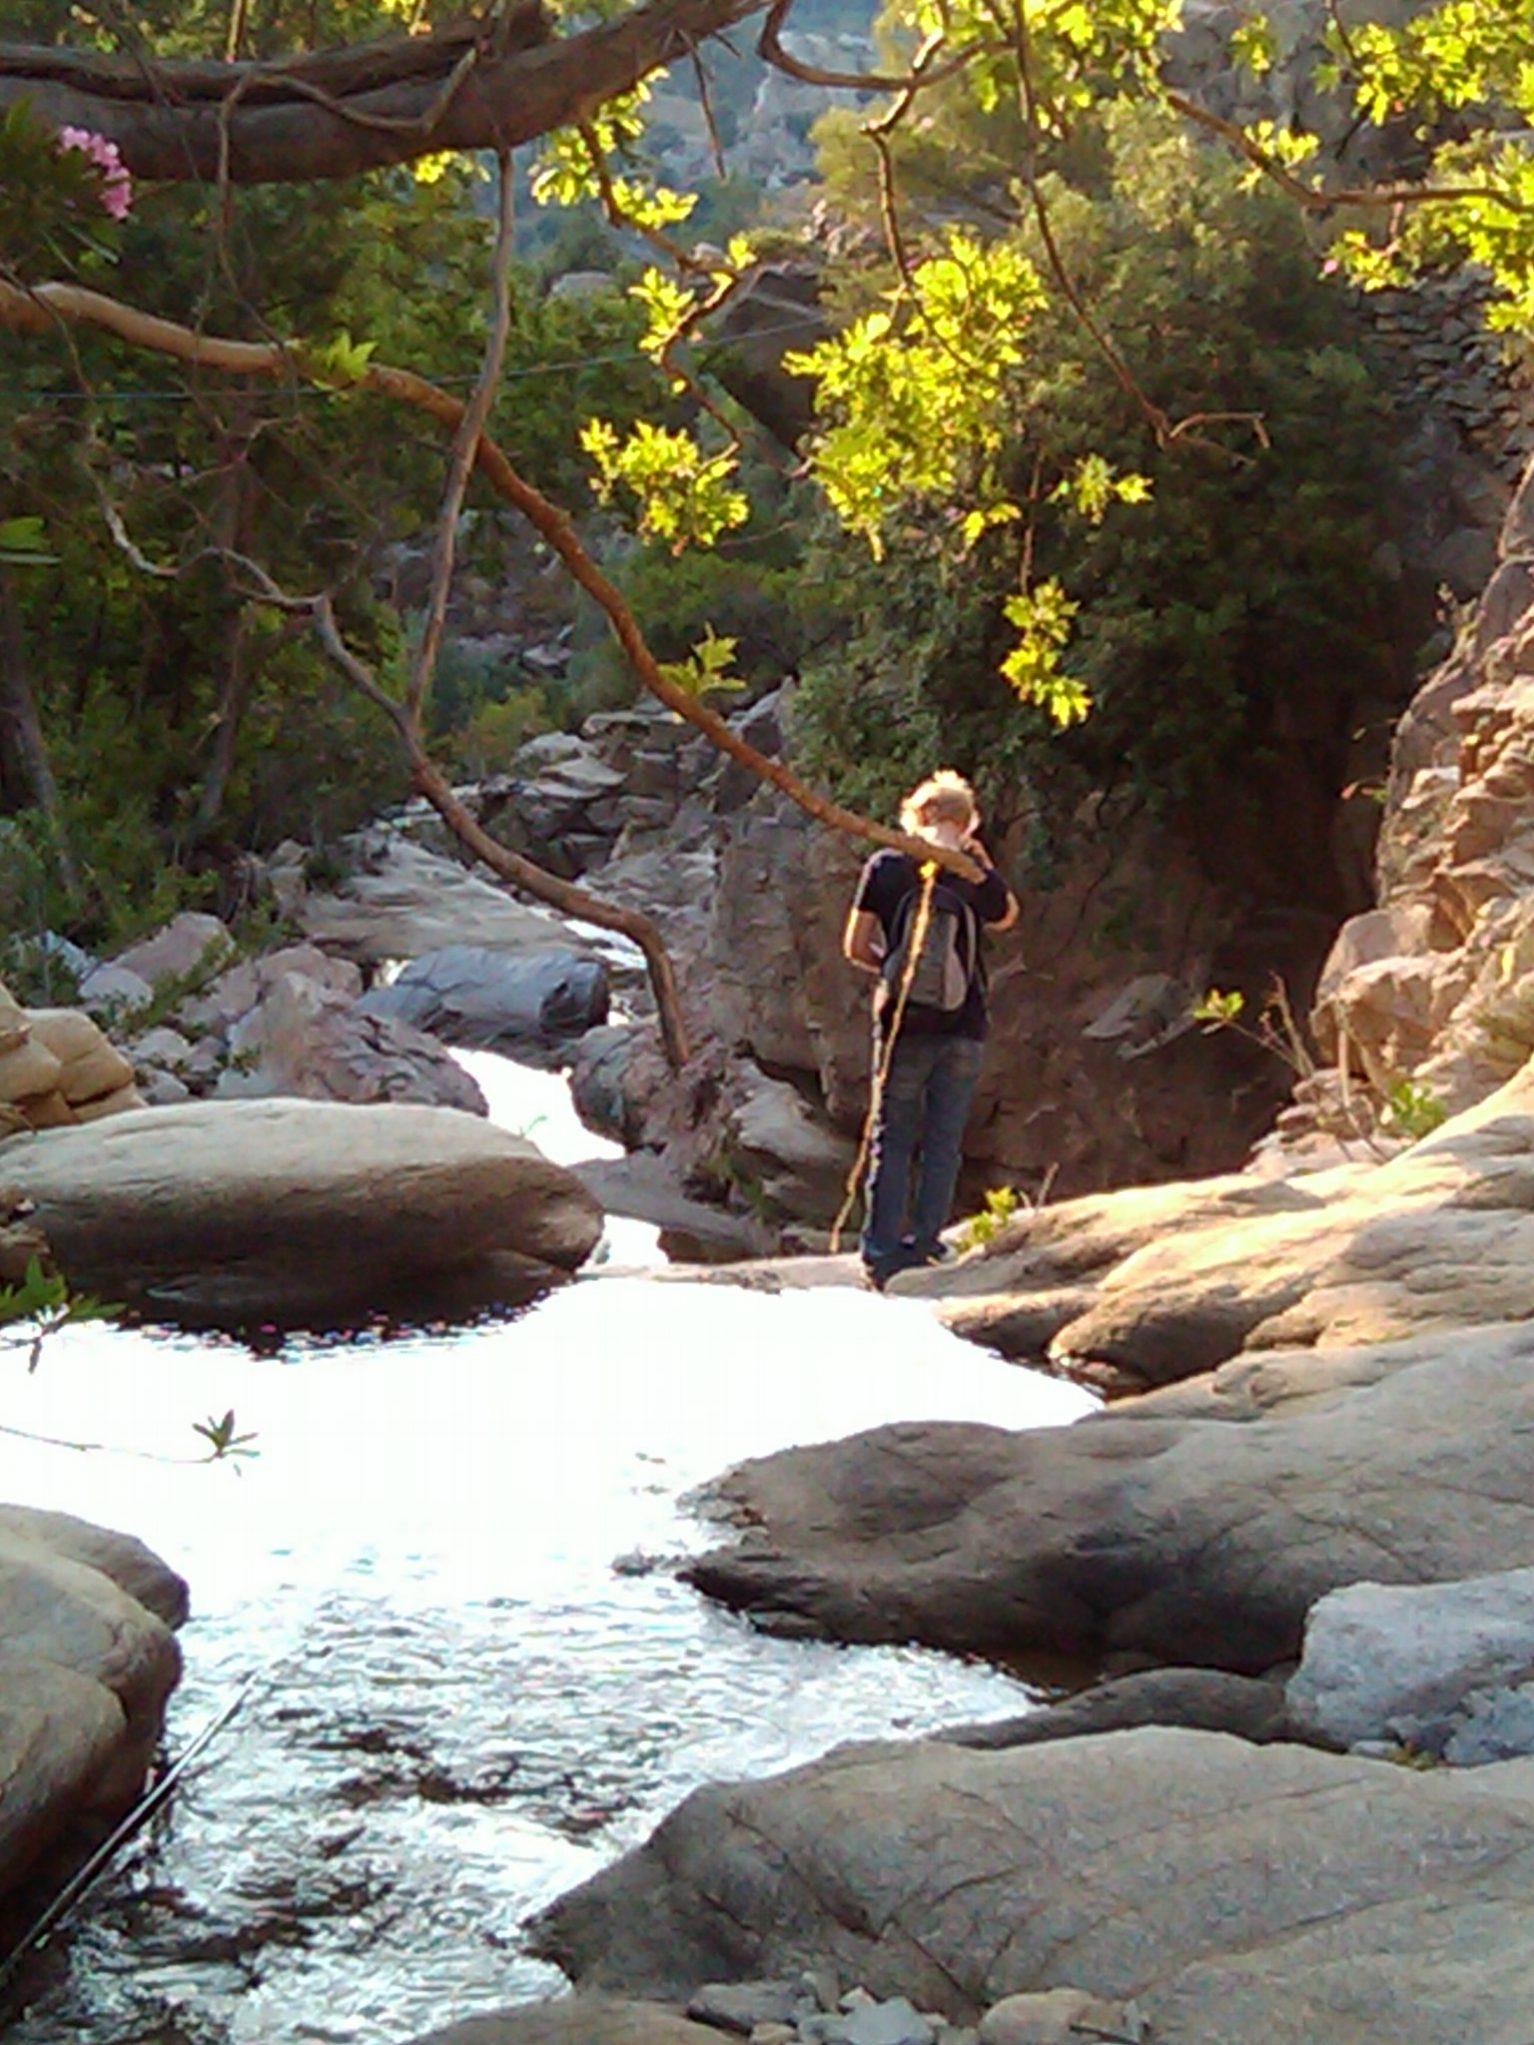 Hiking Amenistis, Ikaria – circular route   Στα μονοπάτια του Αρμενιστή, Ικαρία – κυκλική διαδρομή